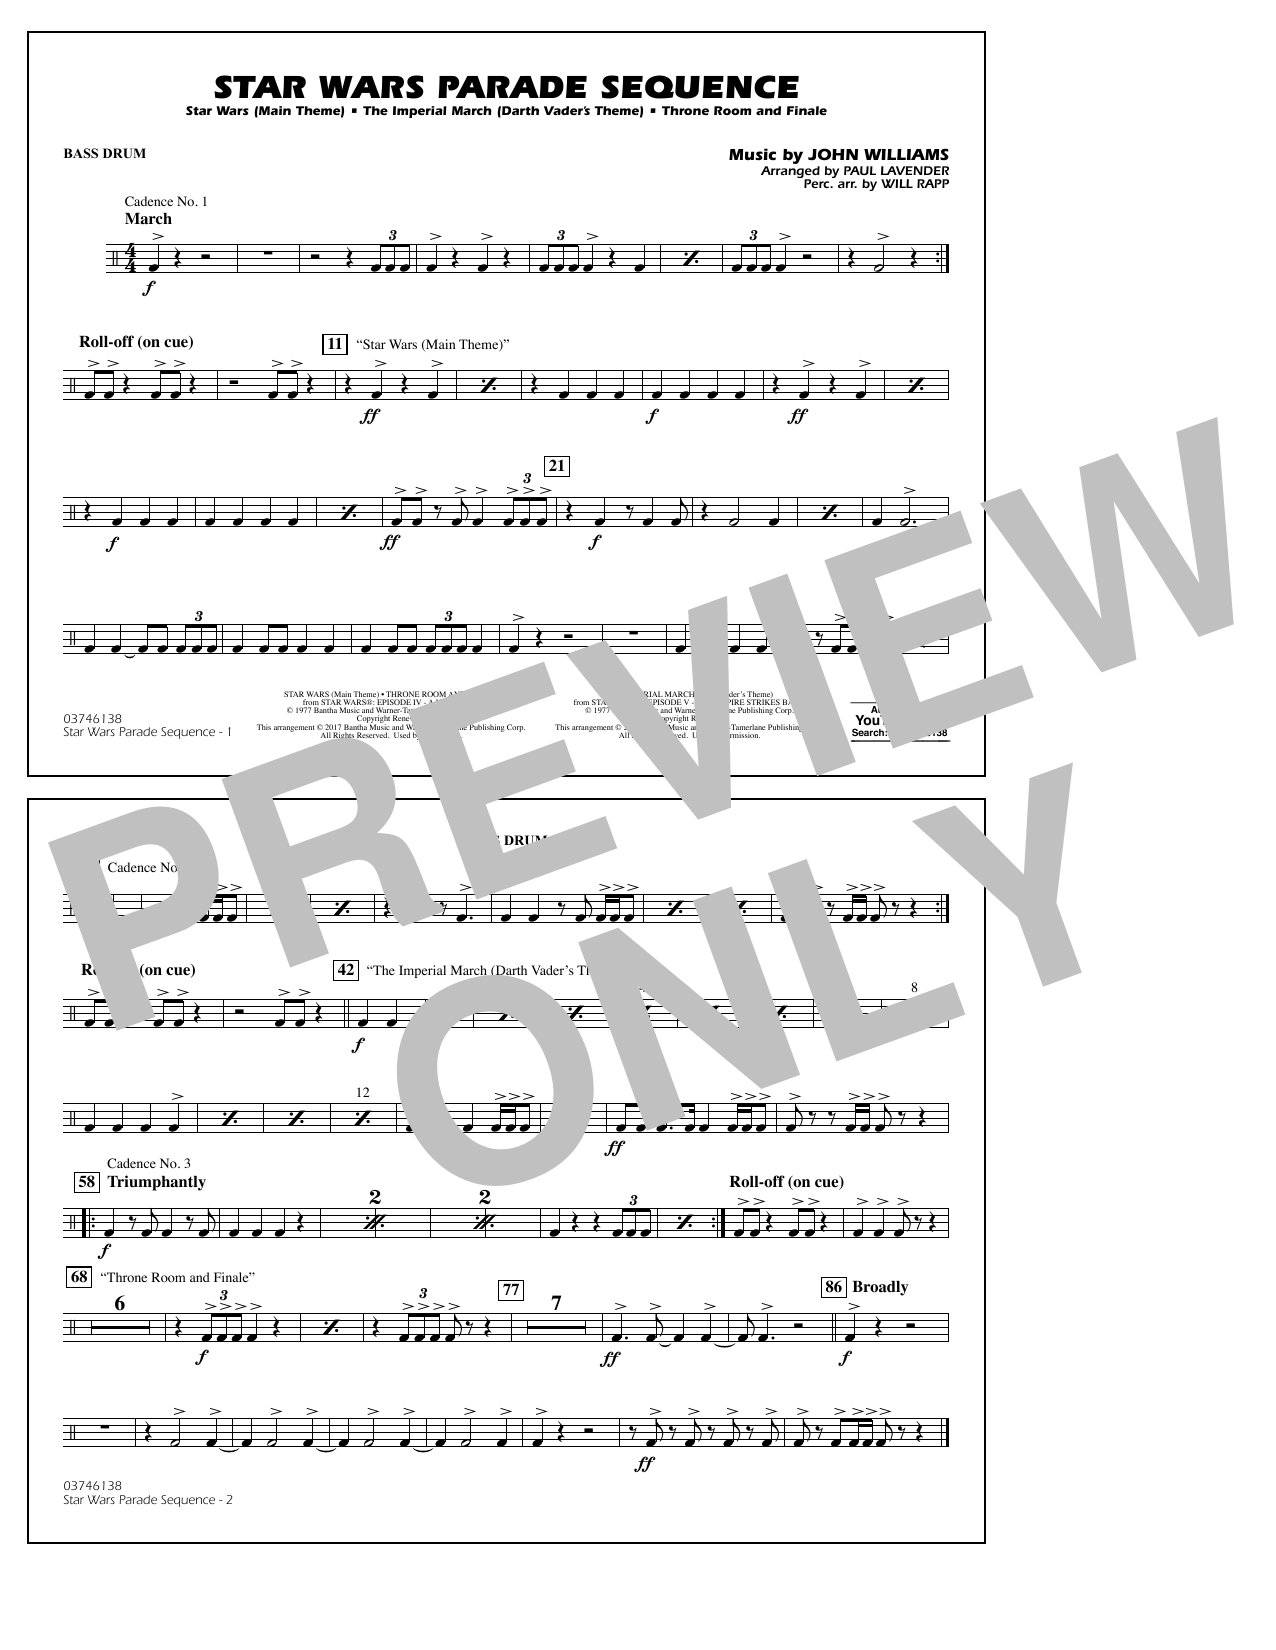 Star Wars Parade Sequence - Bass Drum Sheet Music